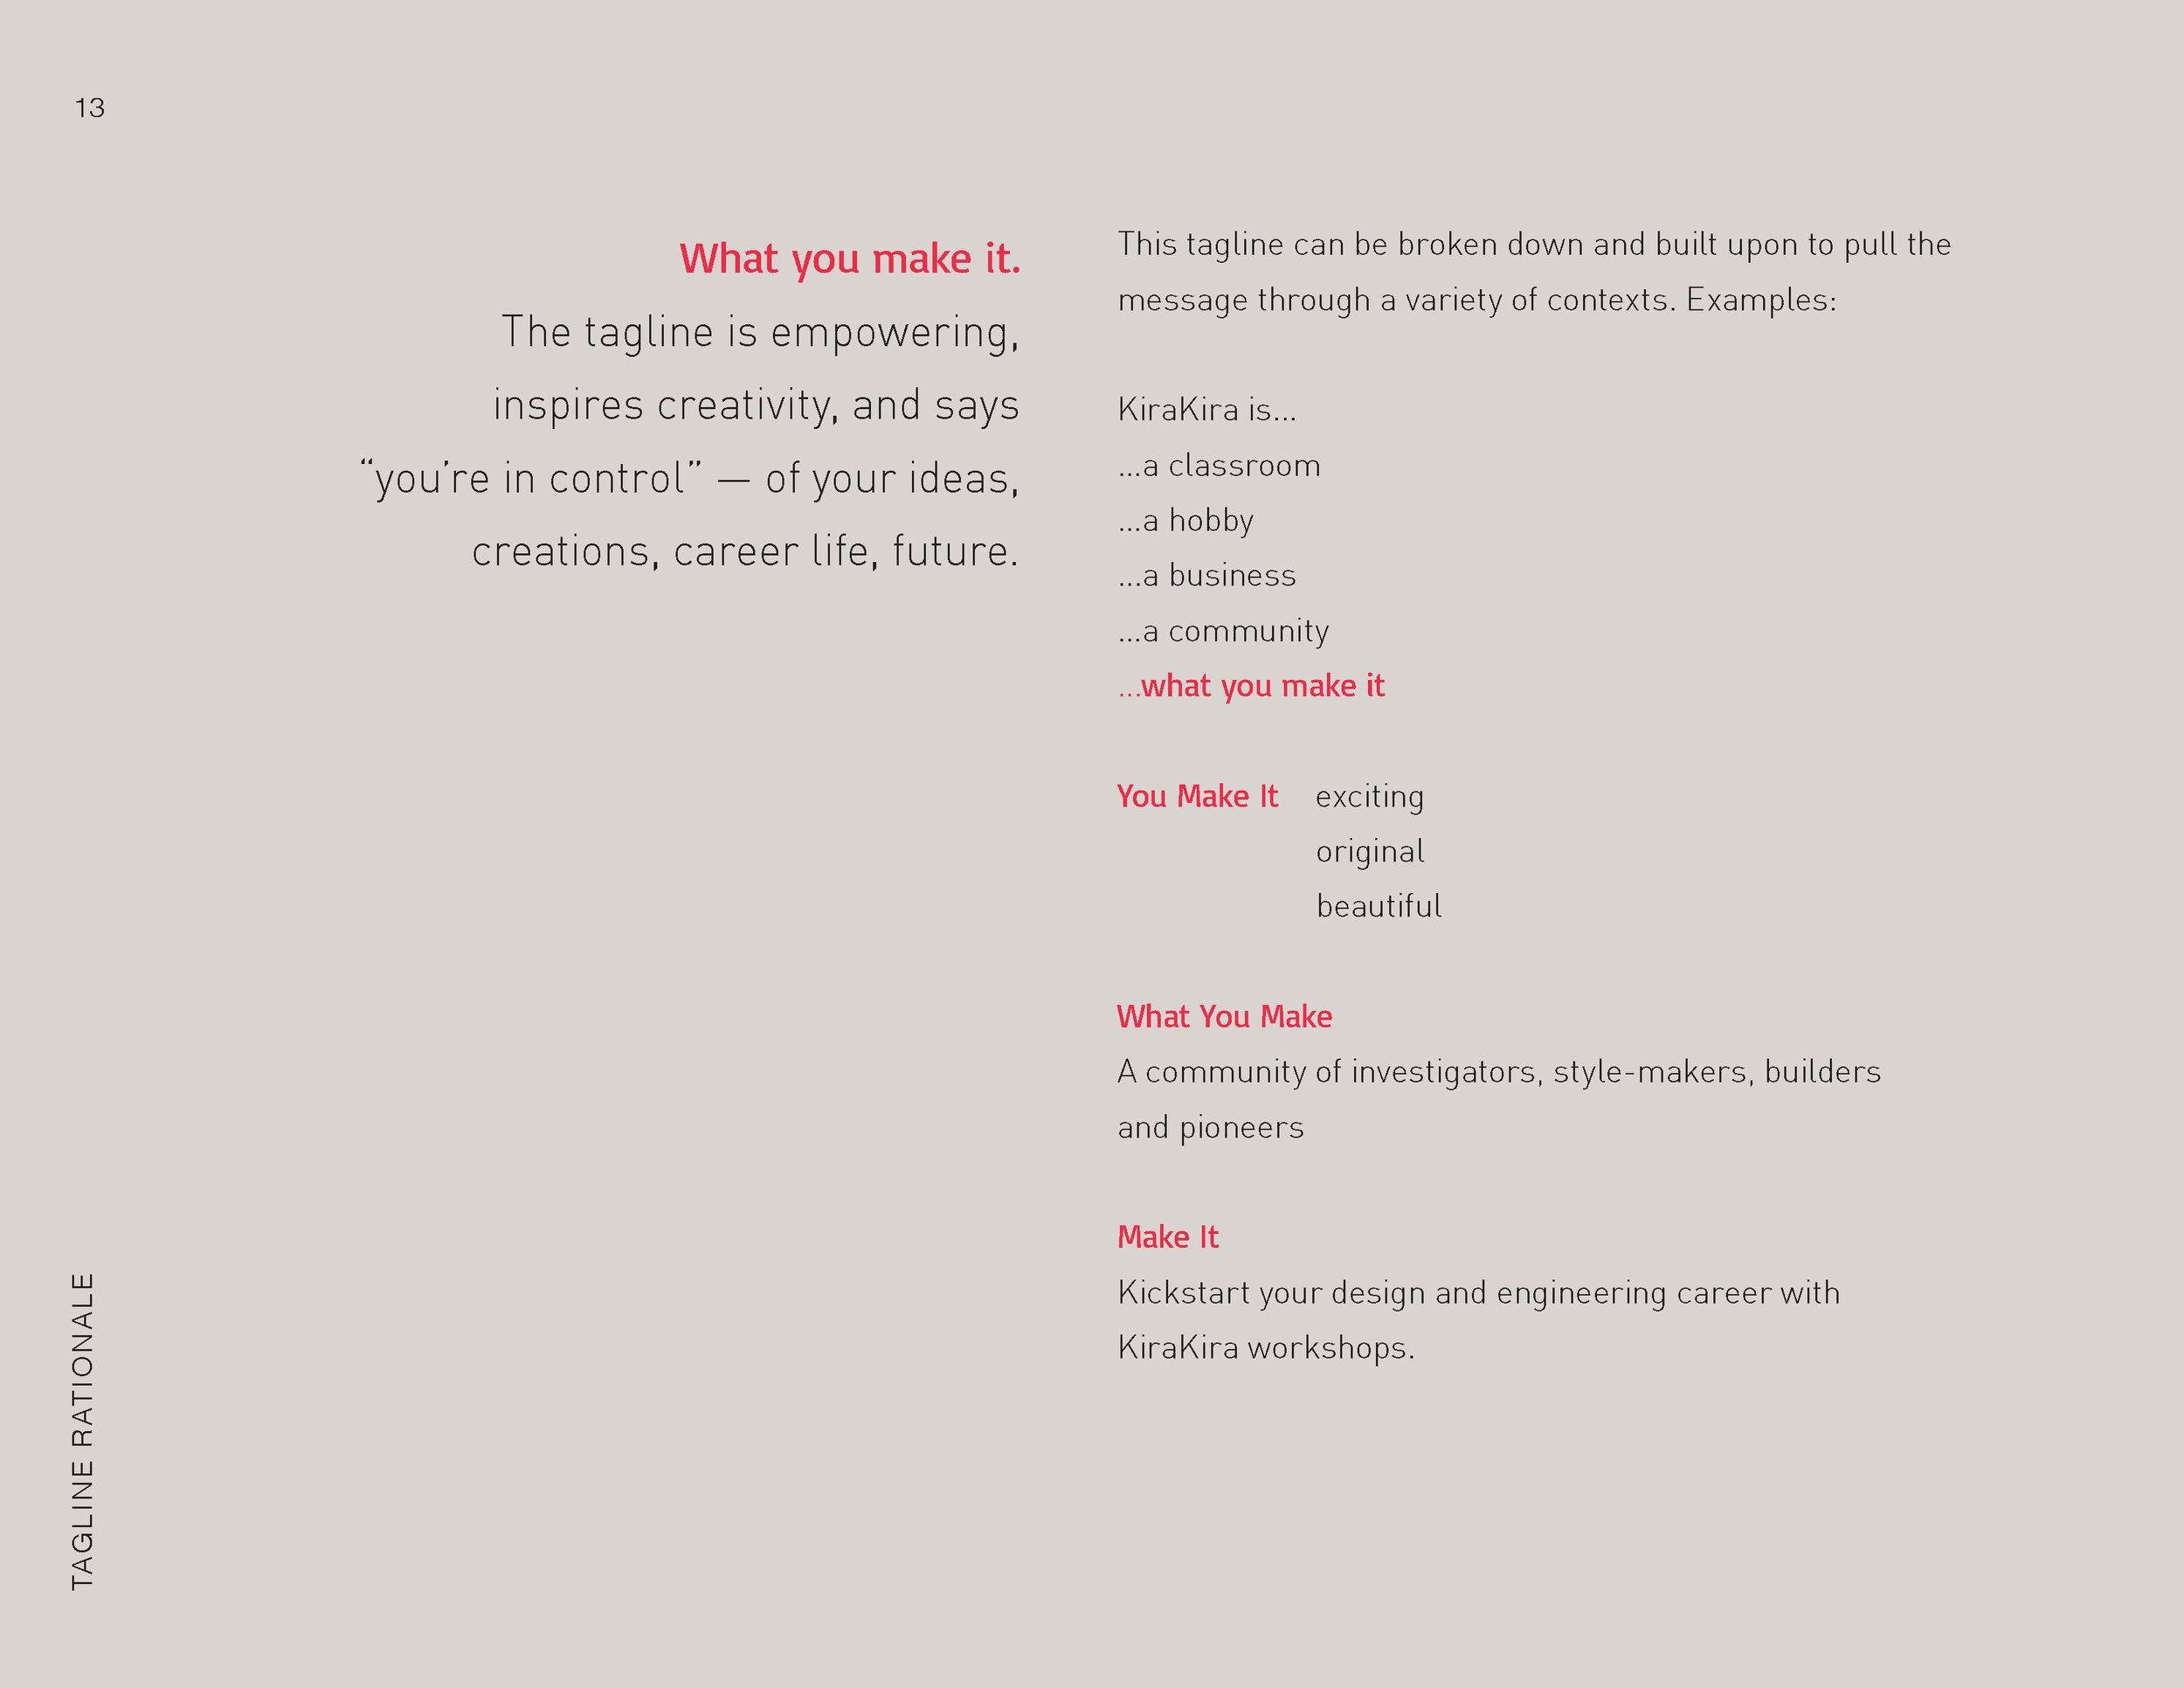 kirakira-brand-guide_Page_13.jpg